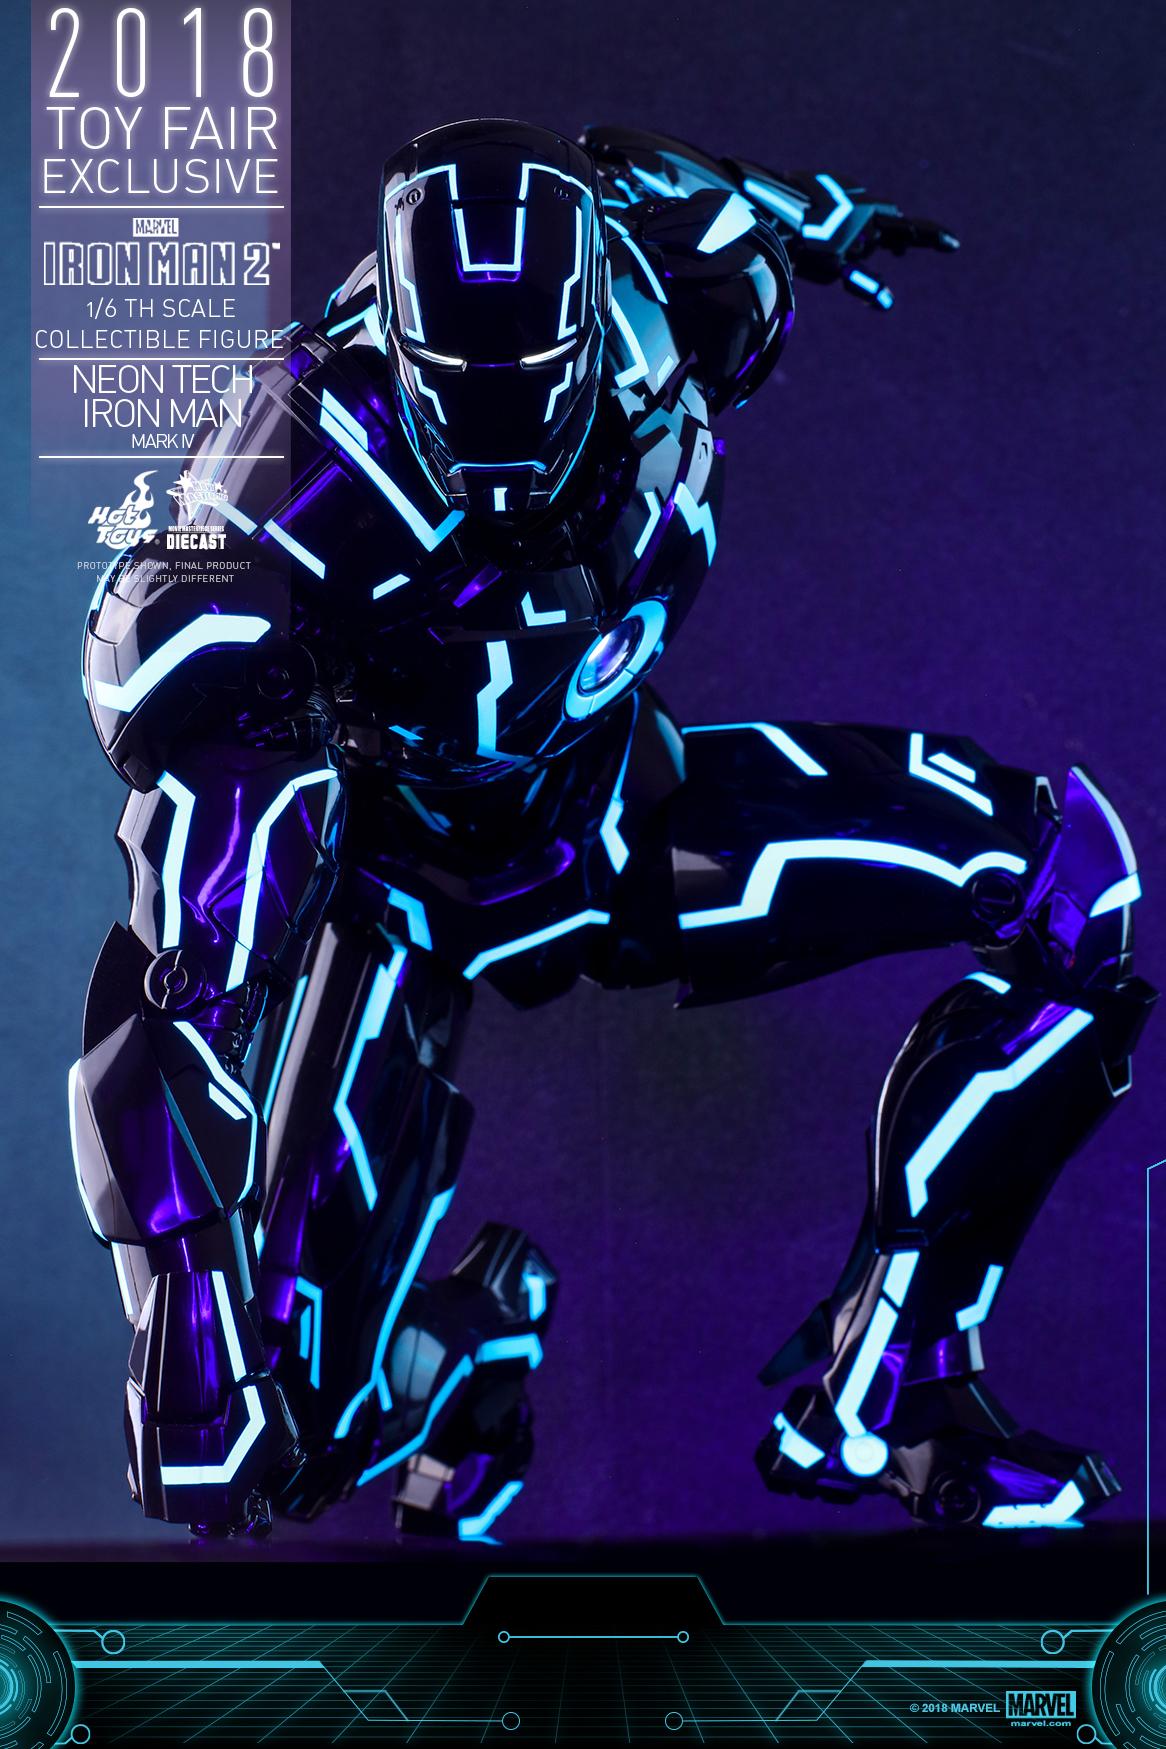 Hot Toys - Iron Man 2 - Neon Tech Iron Man Mark IV collectible figure_PR14